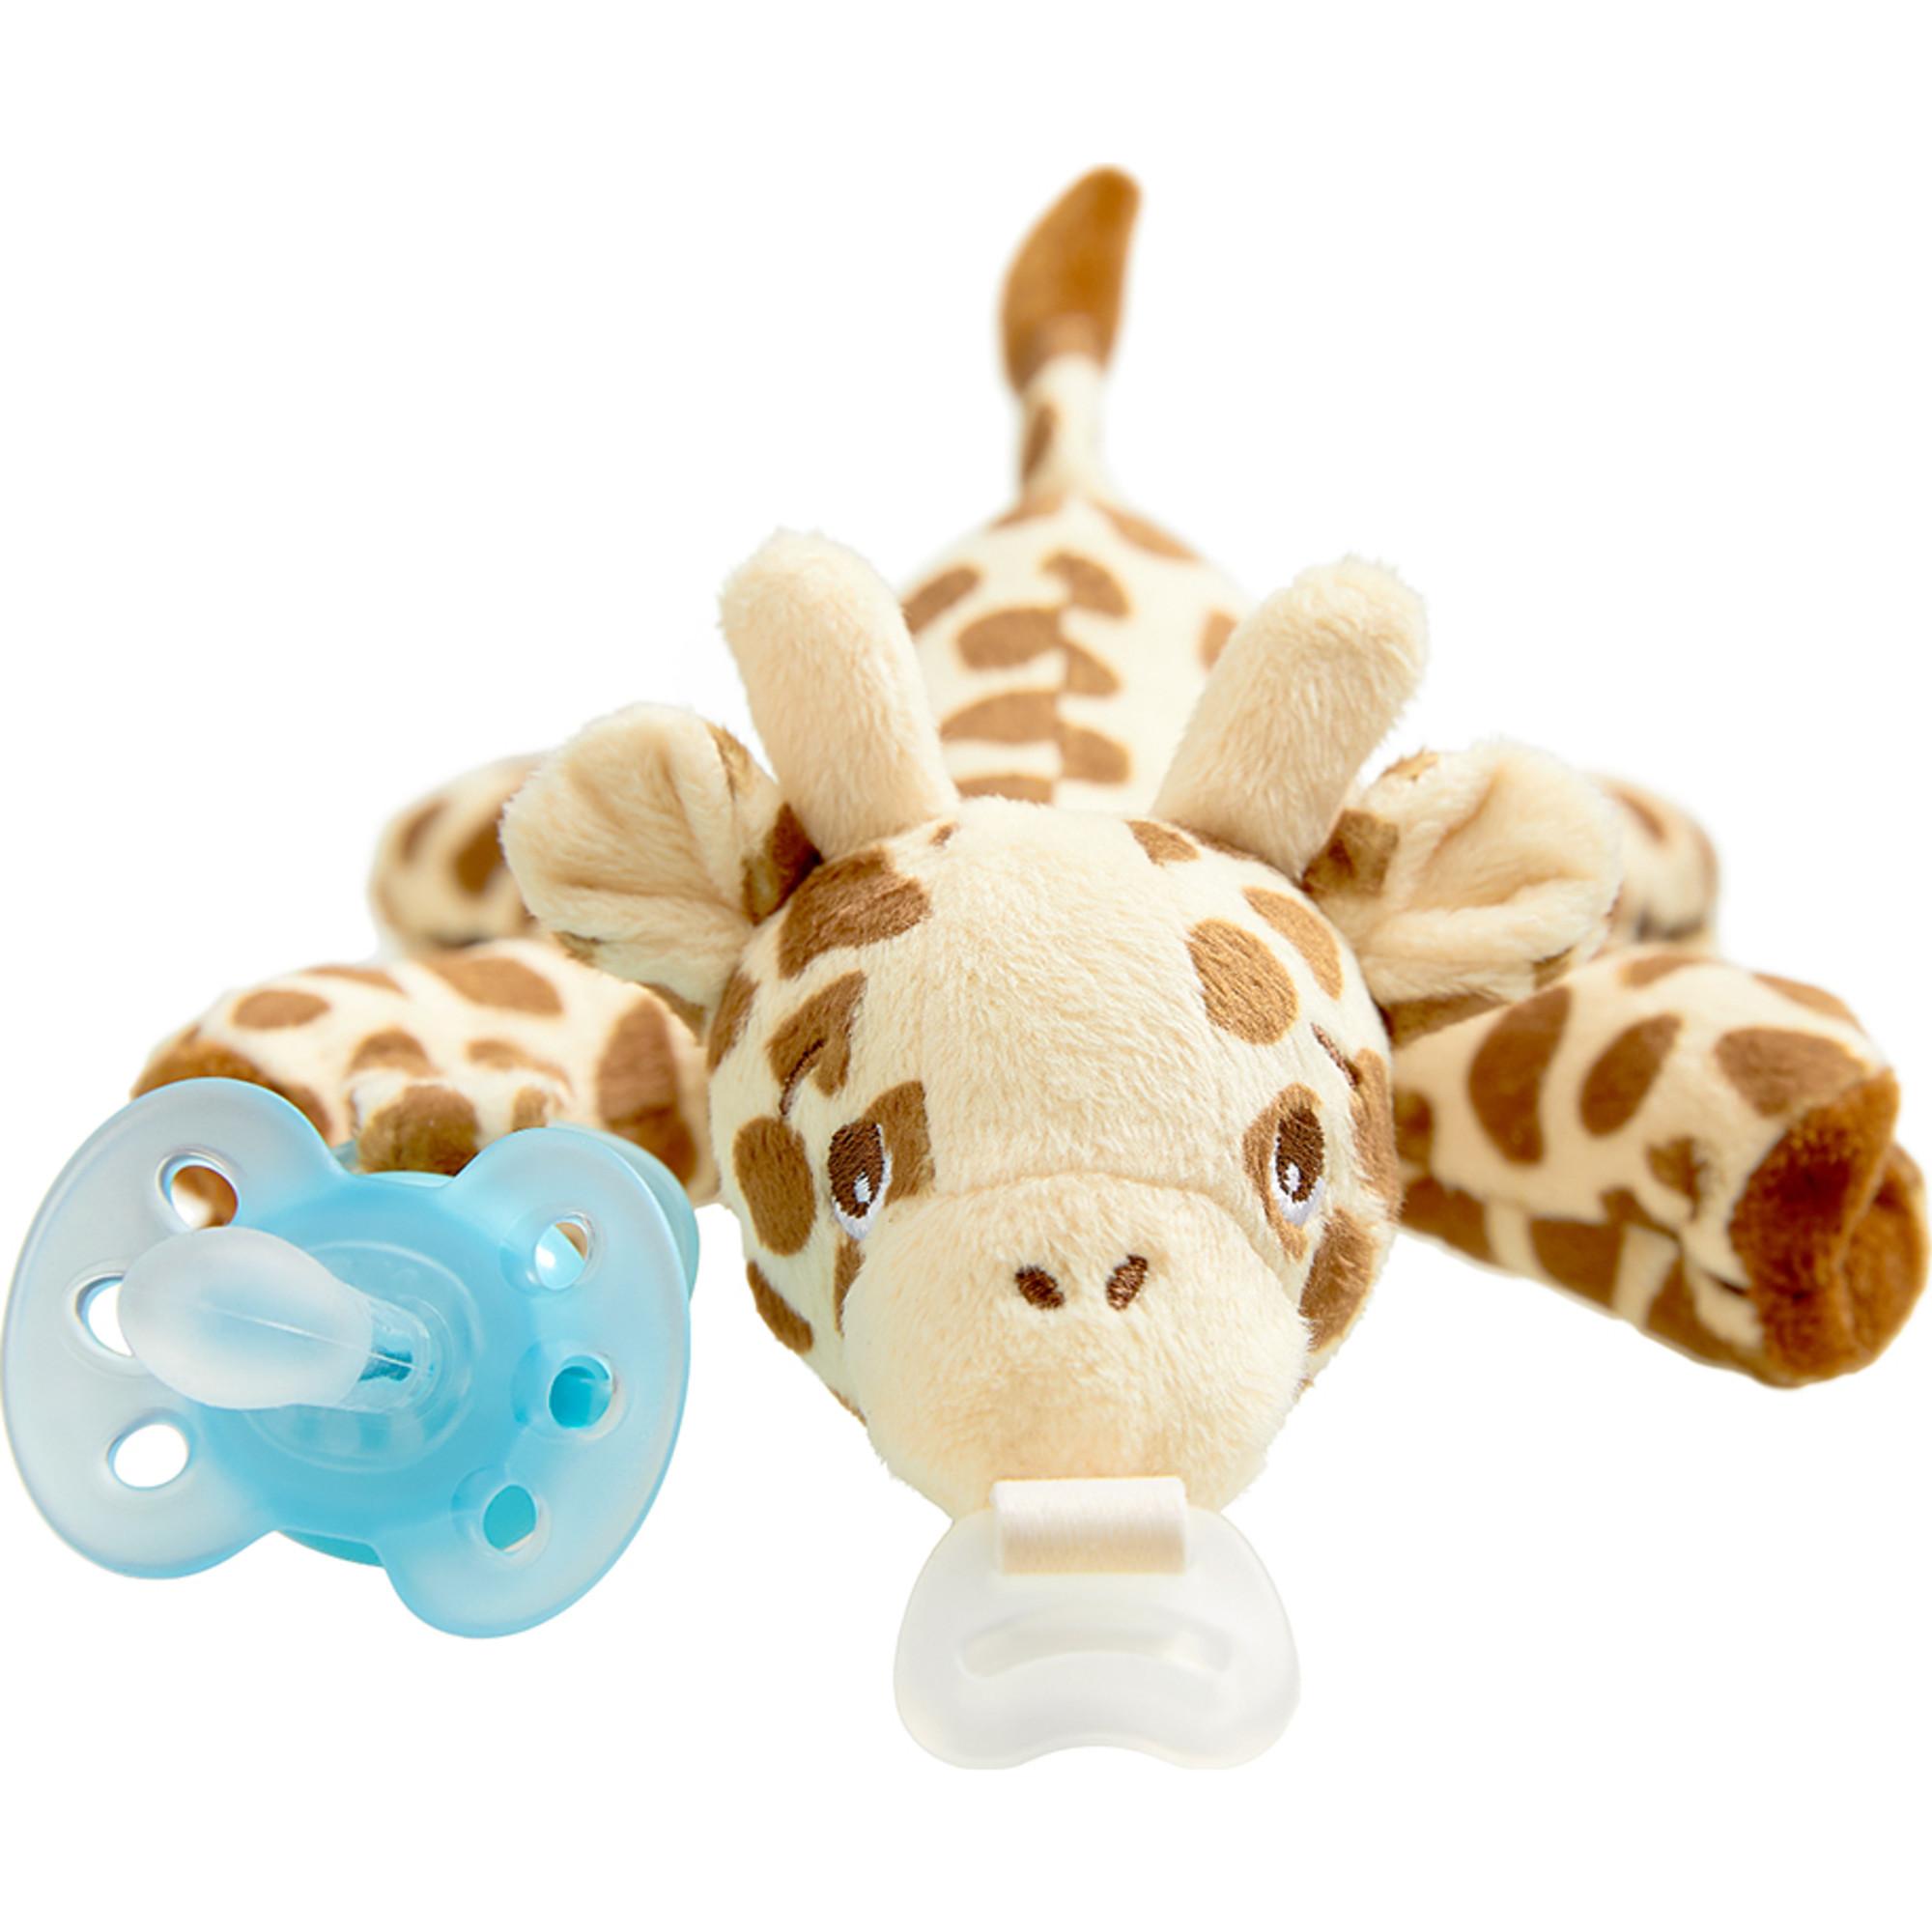 Philips Avent Ultra Soft Snuggle pacifier, 0-6m, Giraffe, SCF348/01